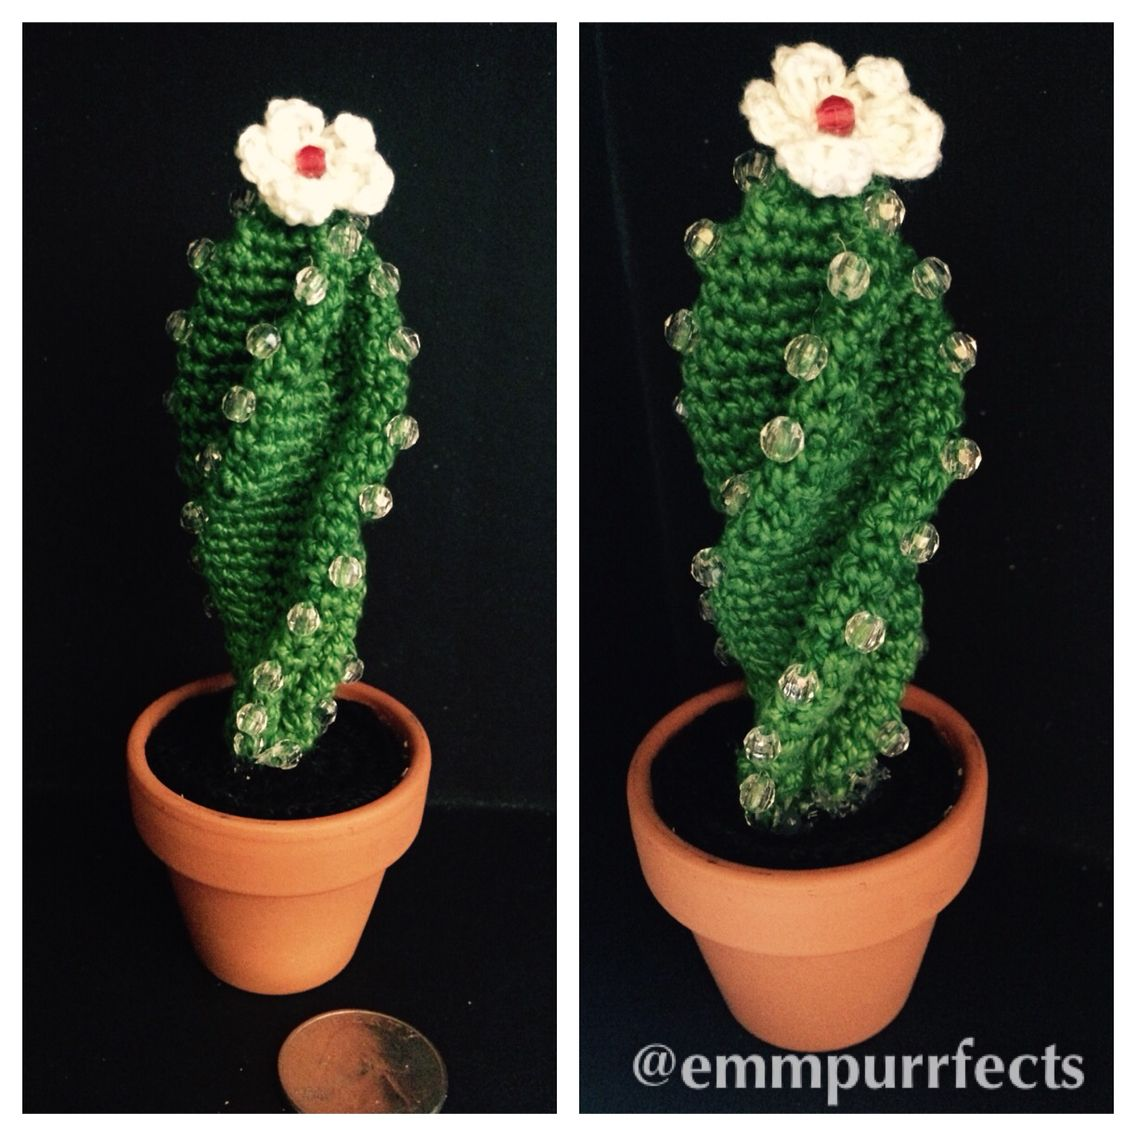 Gli ultimi cactus dell'estate (com imagens) | Cacto de crochê ... | 1136x1136